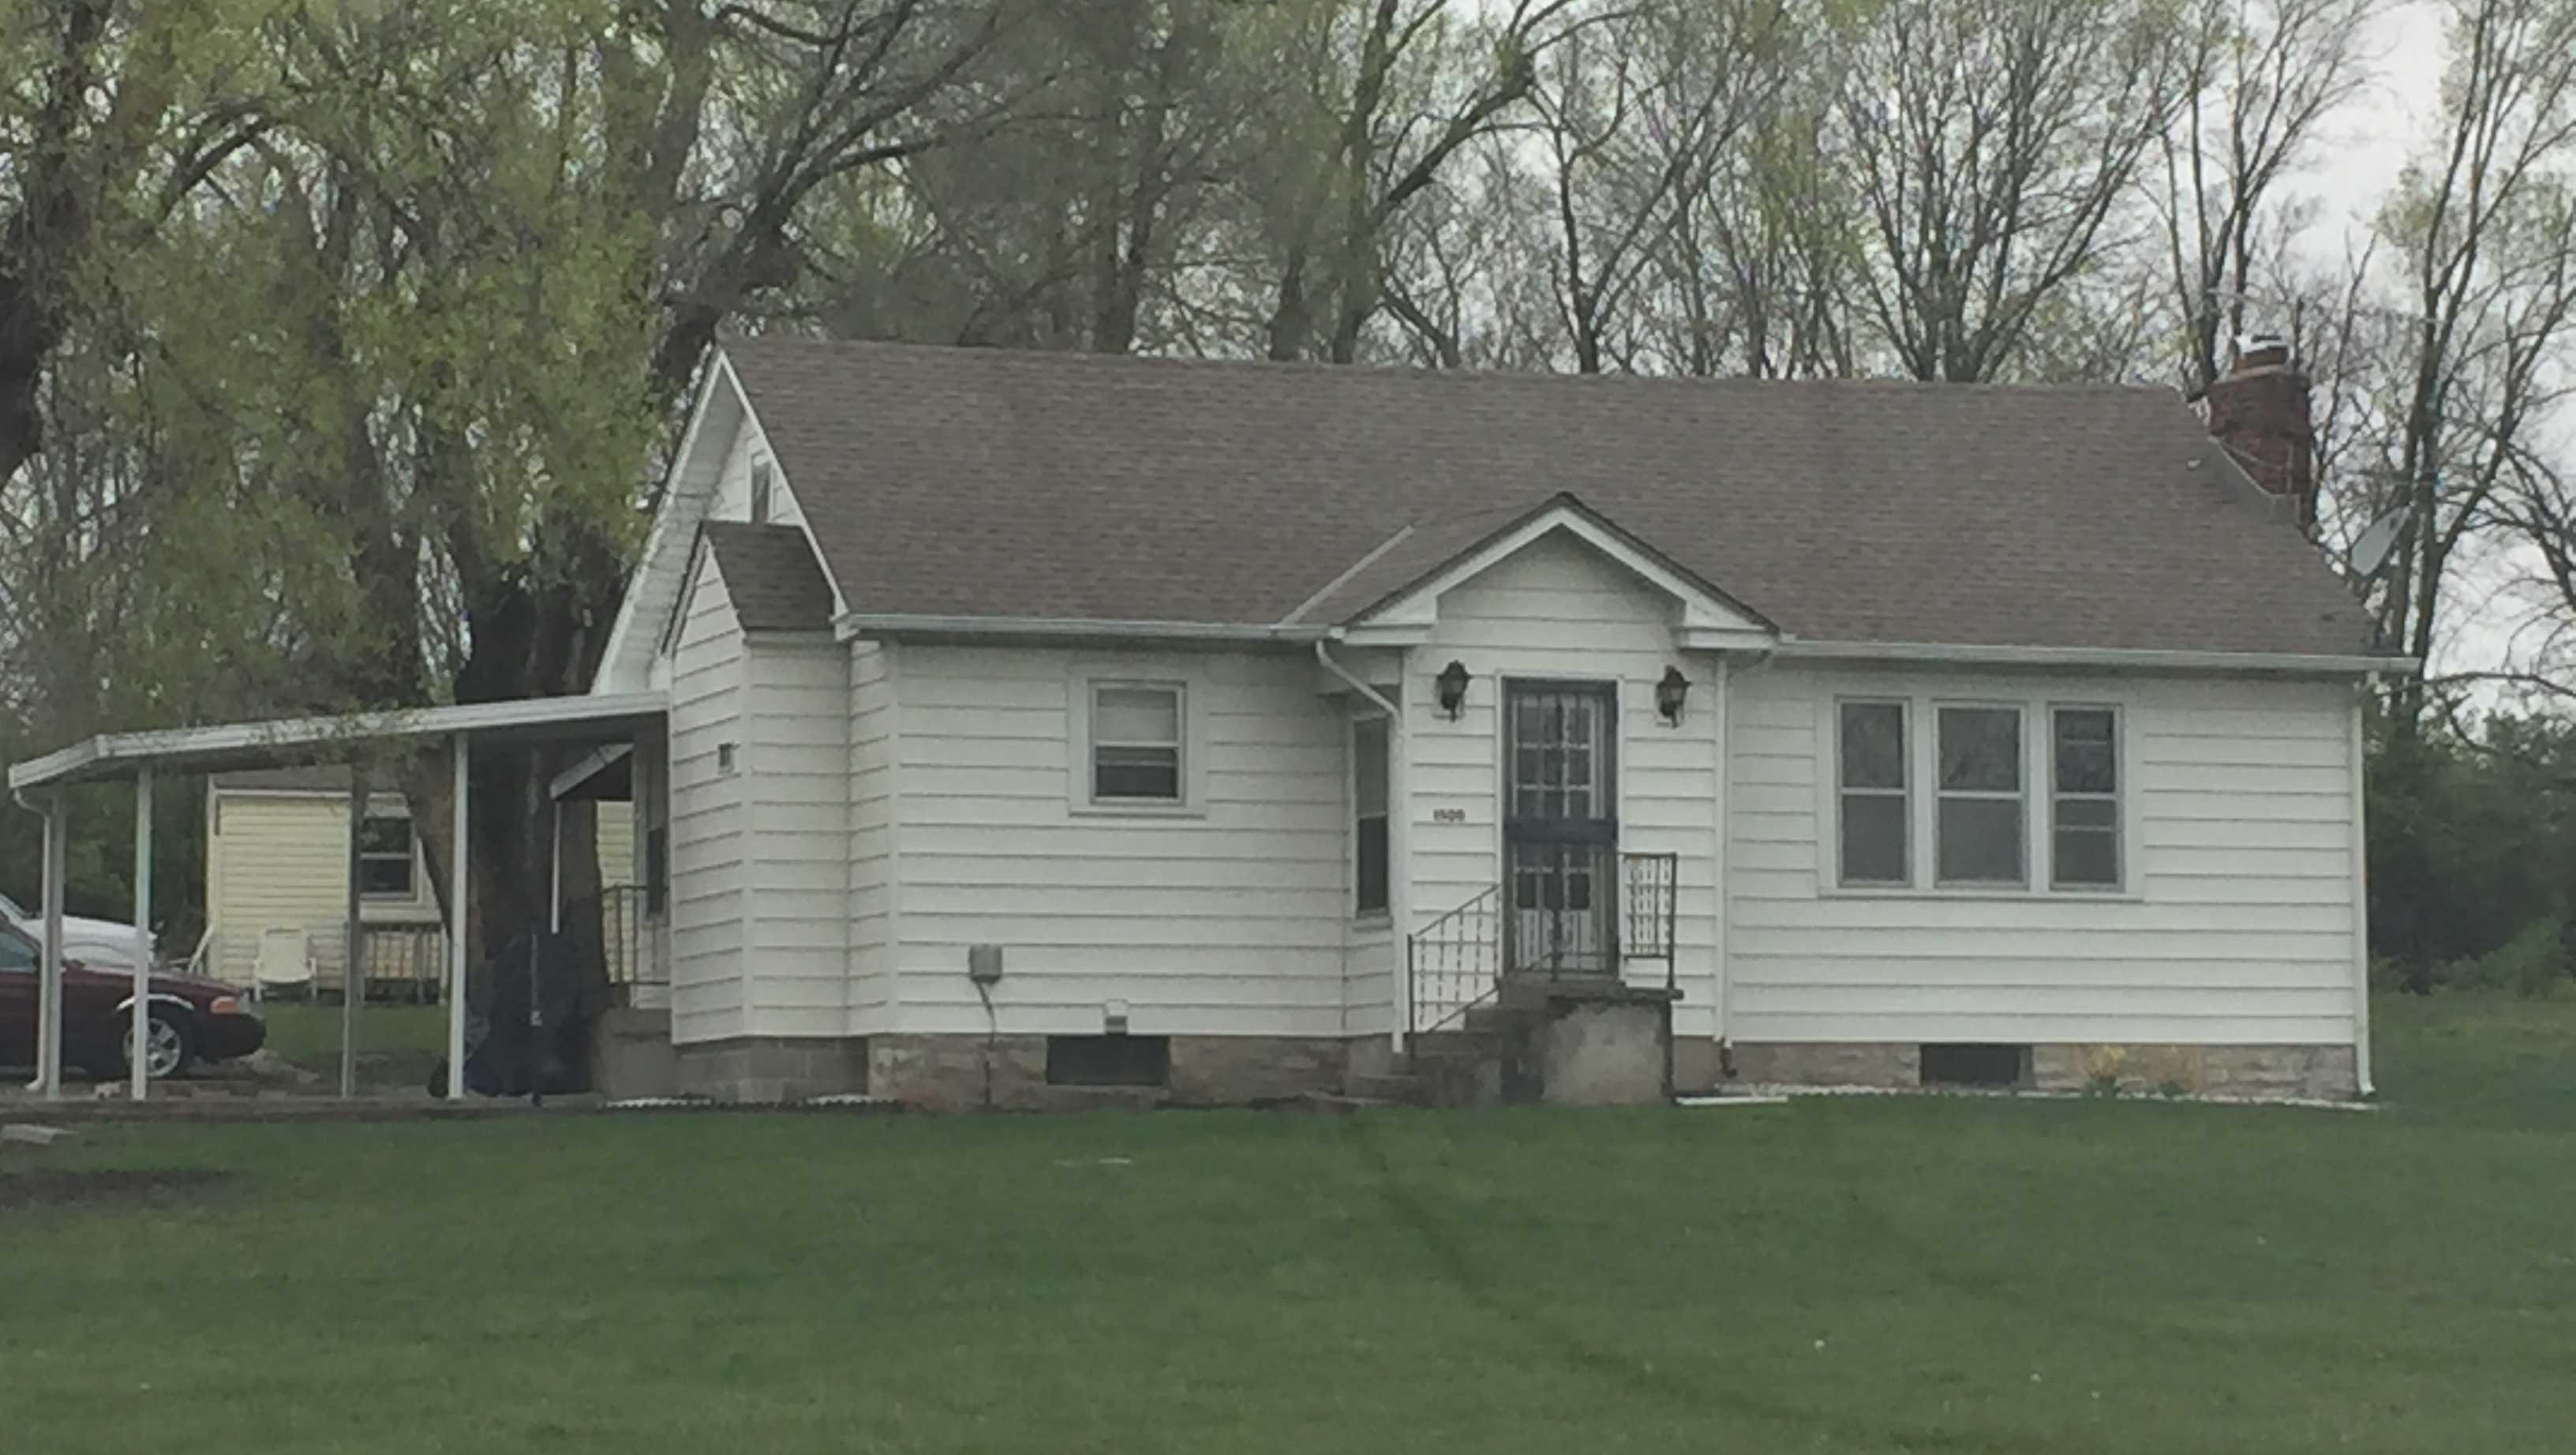 Belton homicide, North Scott Avenue